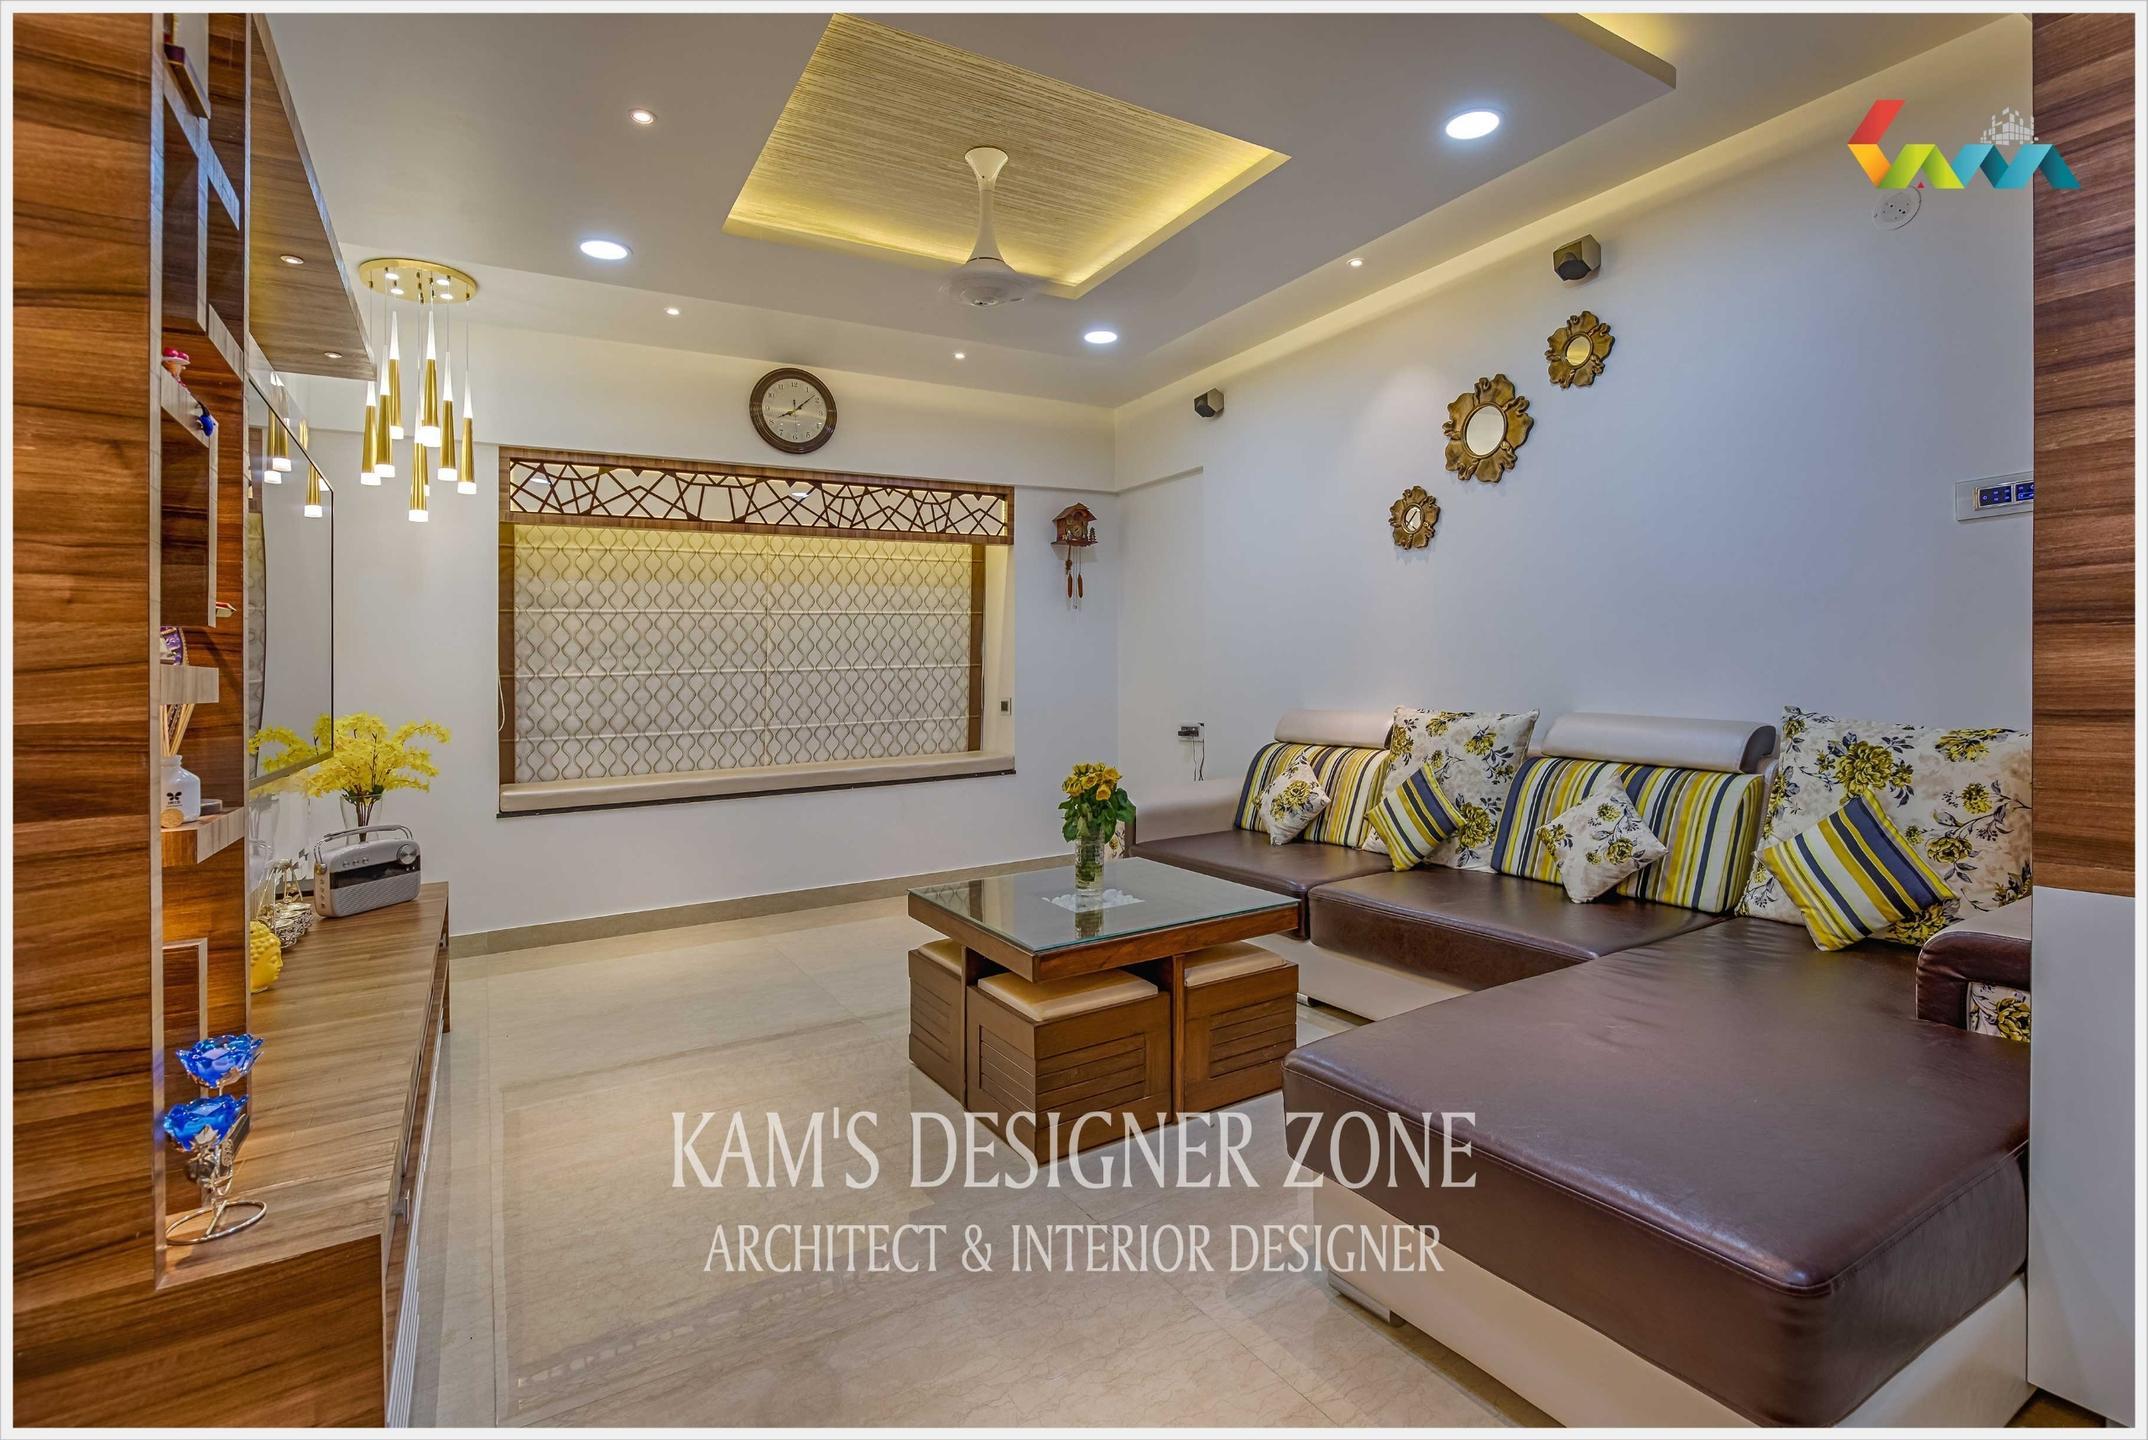 Kam's Designer Zone (@kamsdesigner) Cover Image